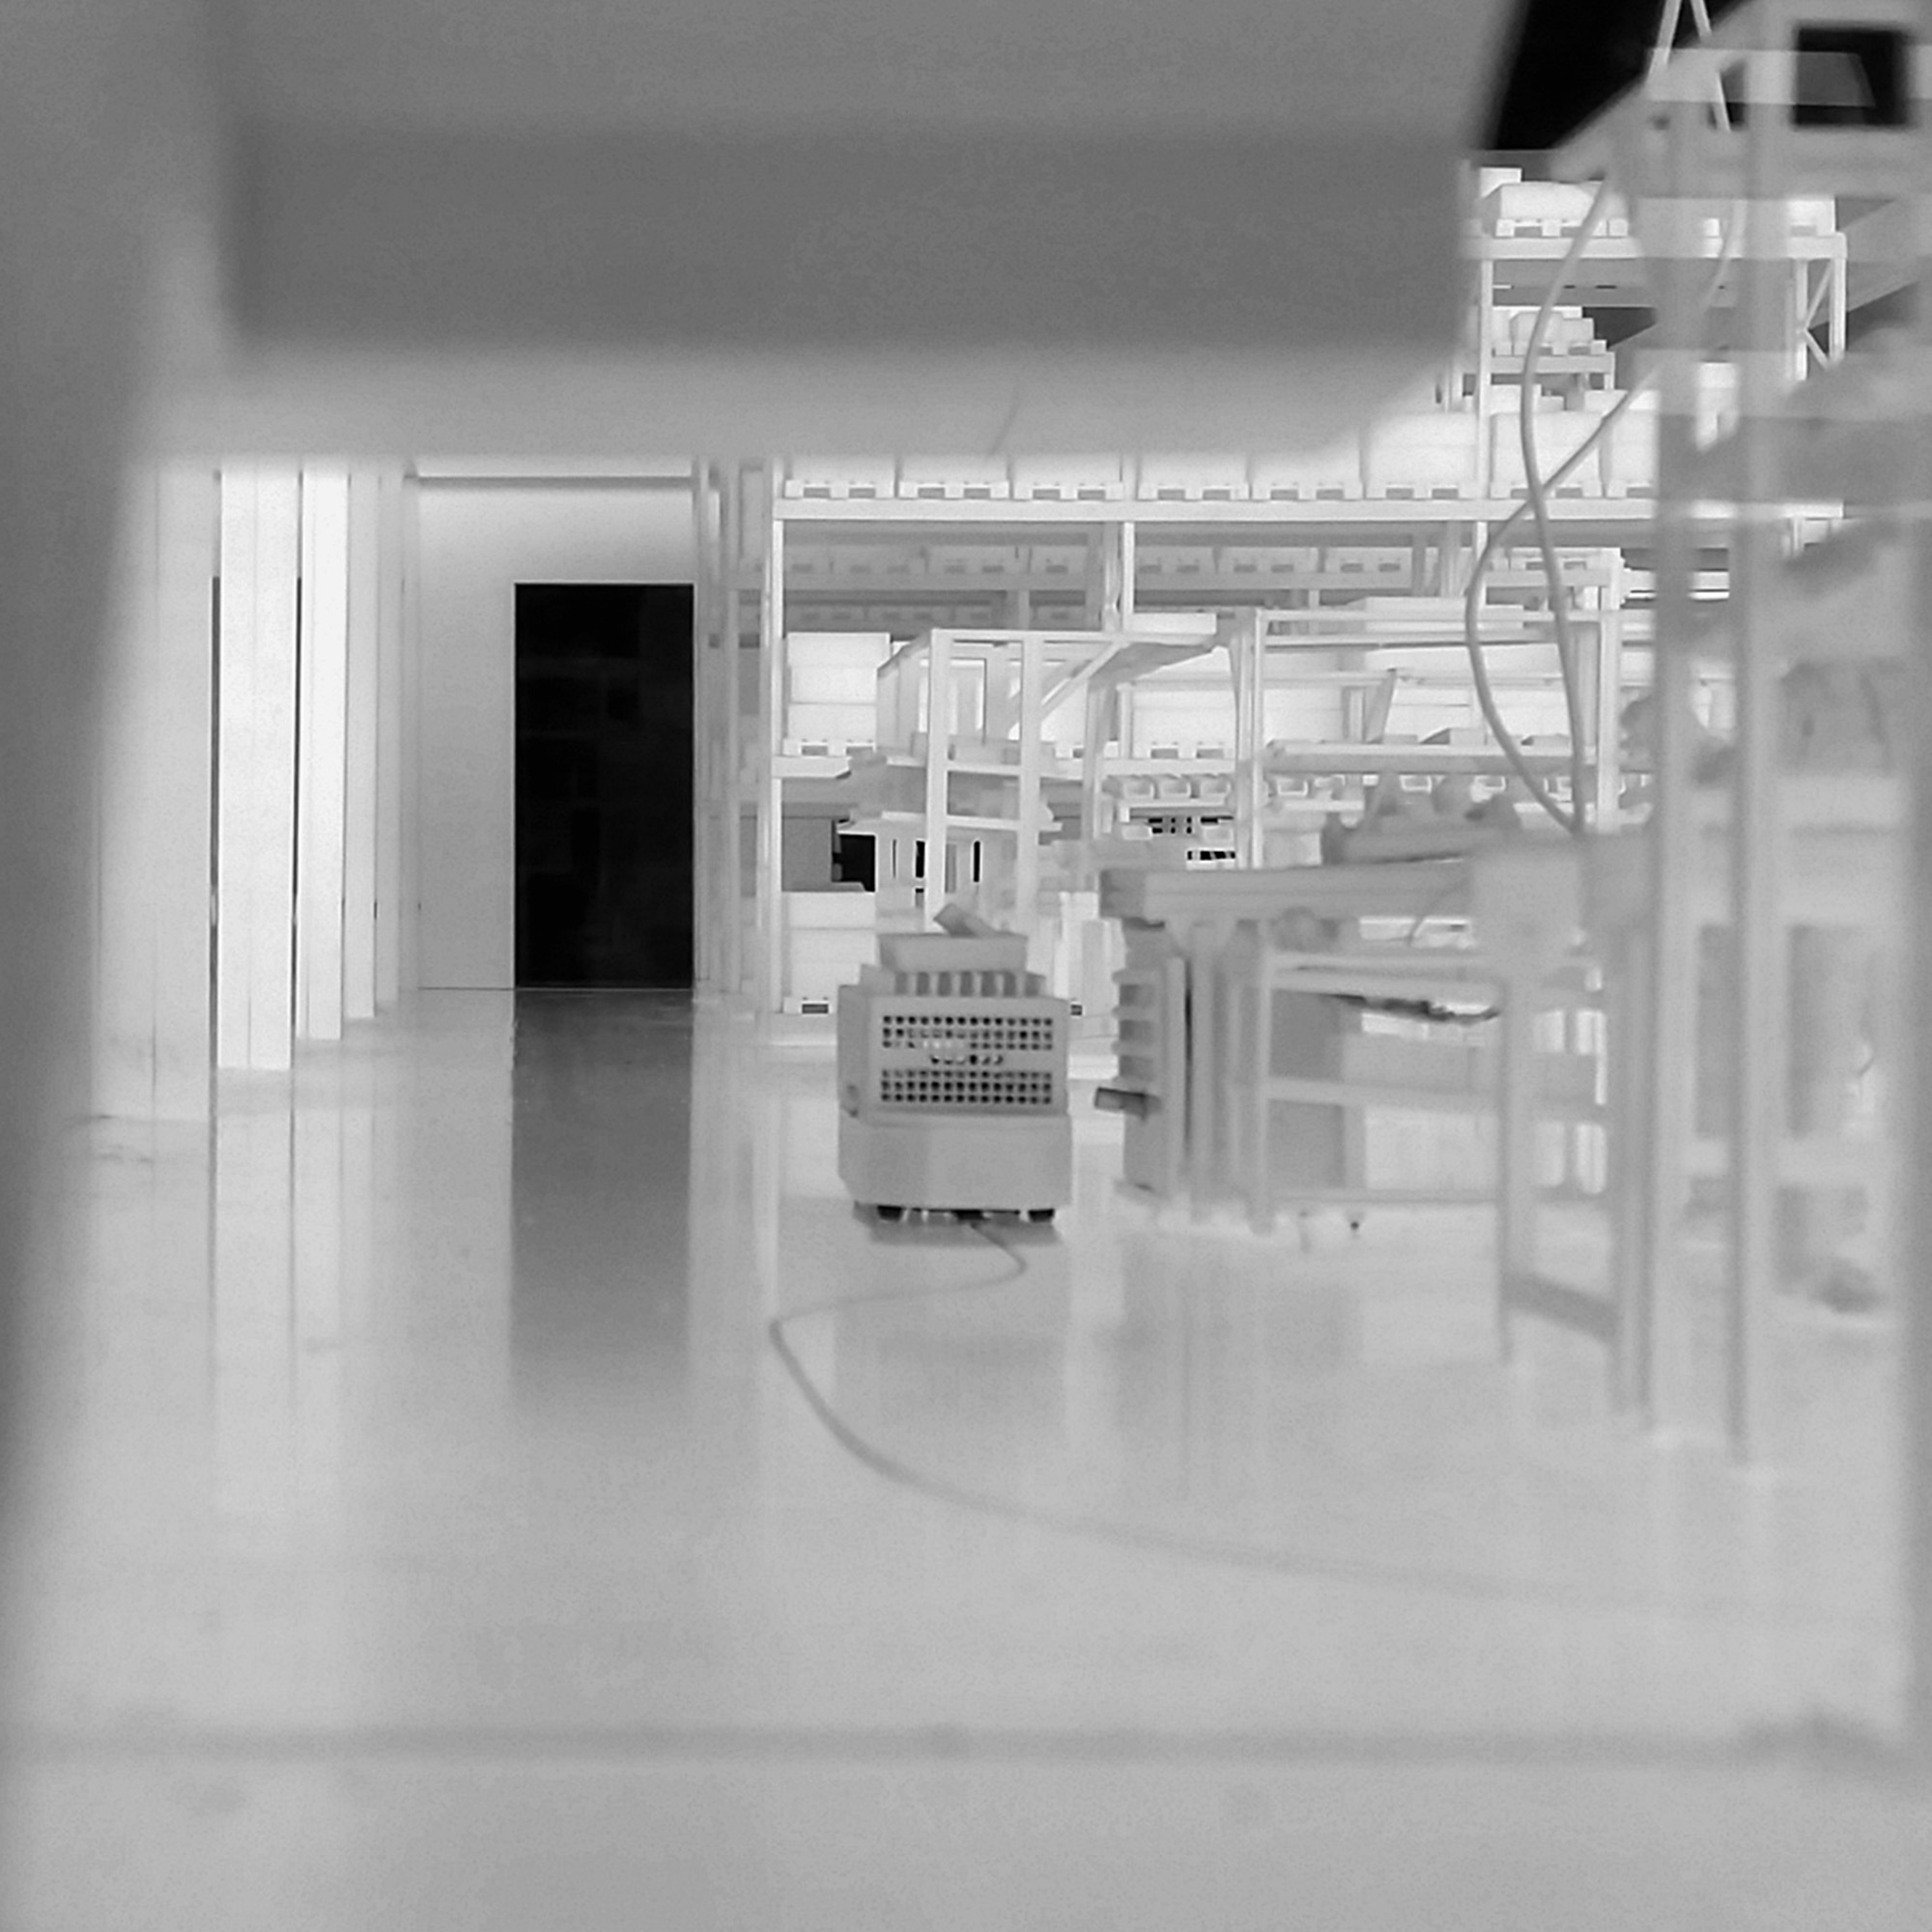 Logimat Exponat Werkshallenmodell mit fahrendem Weasel FTS